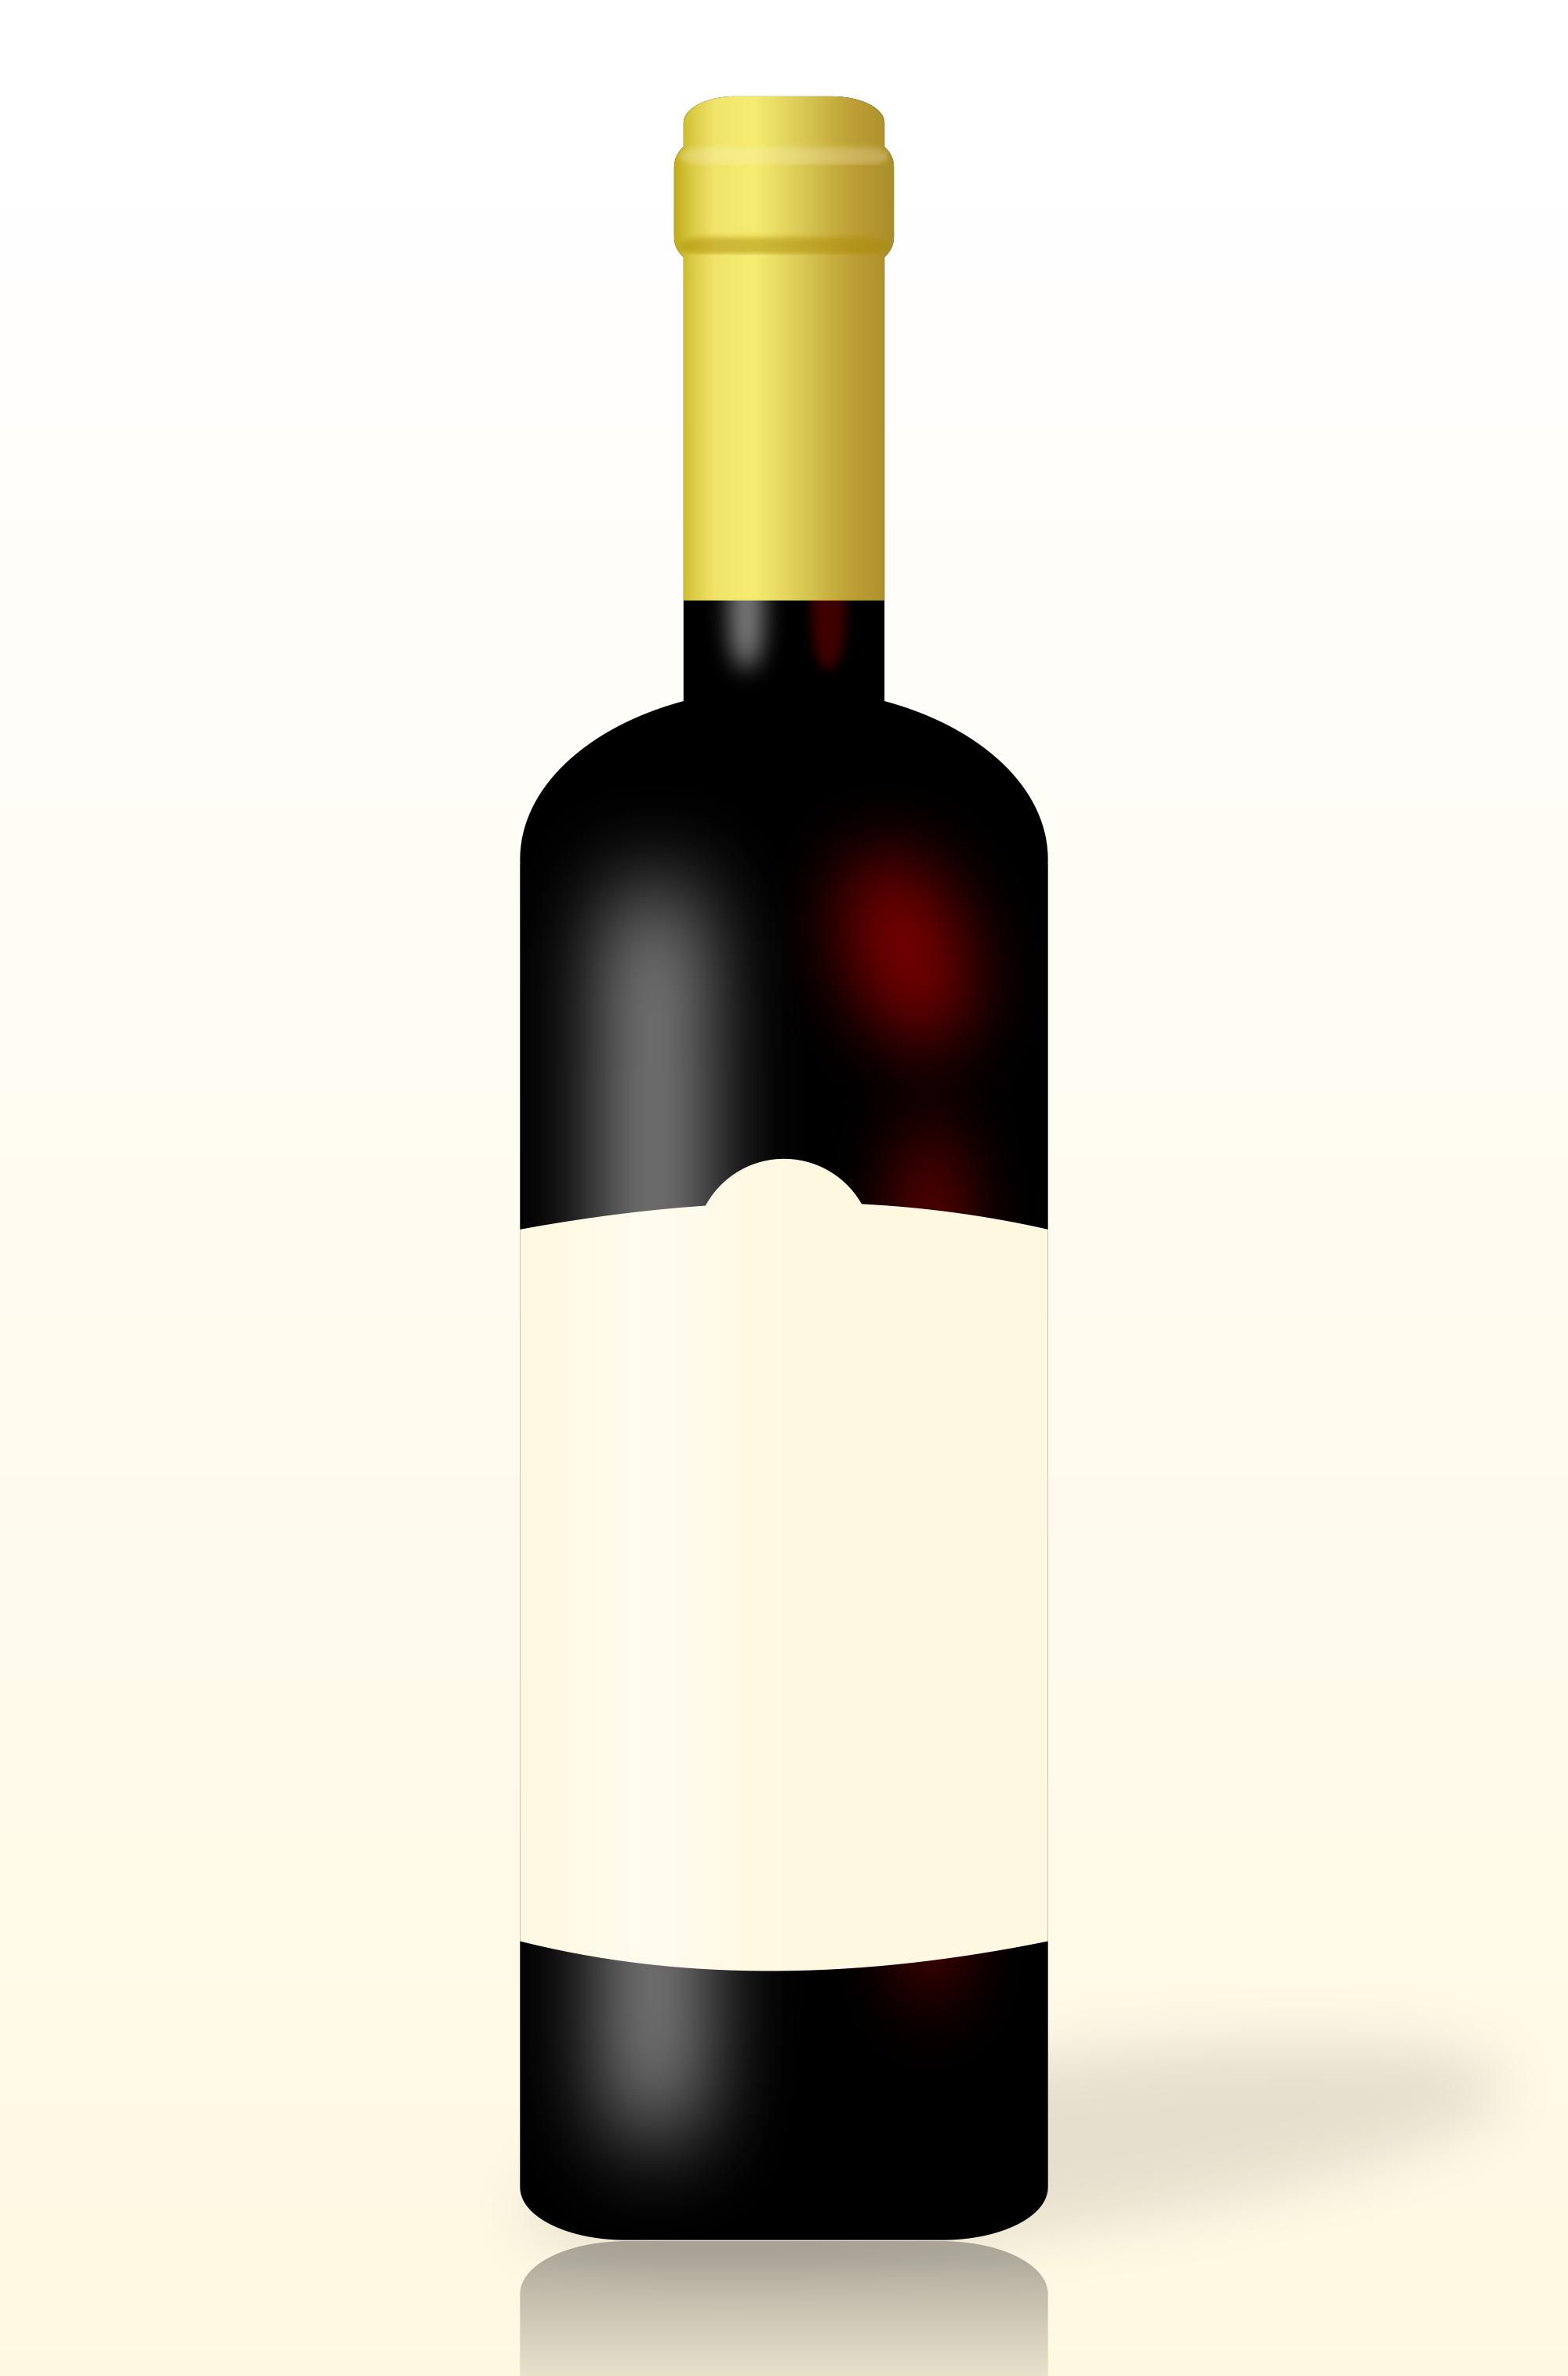 Bottles svg #18, Download drawings